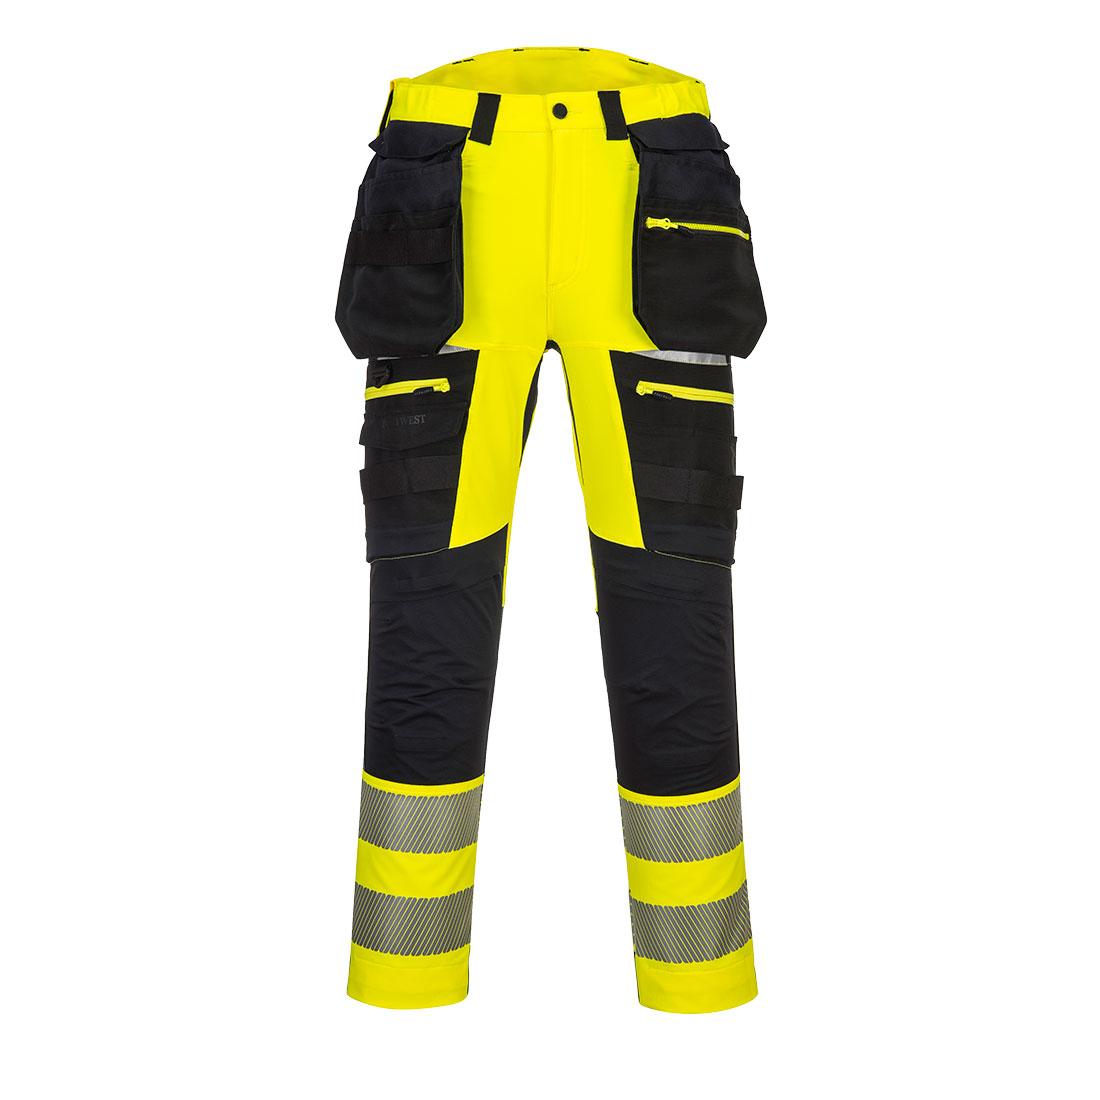 DX4 Hi-Vis Holster Trousers